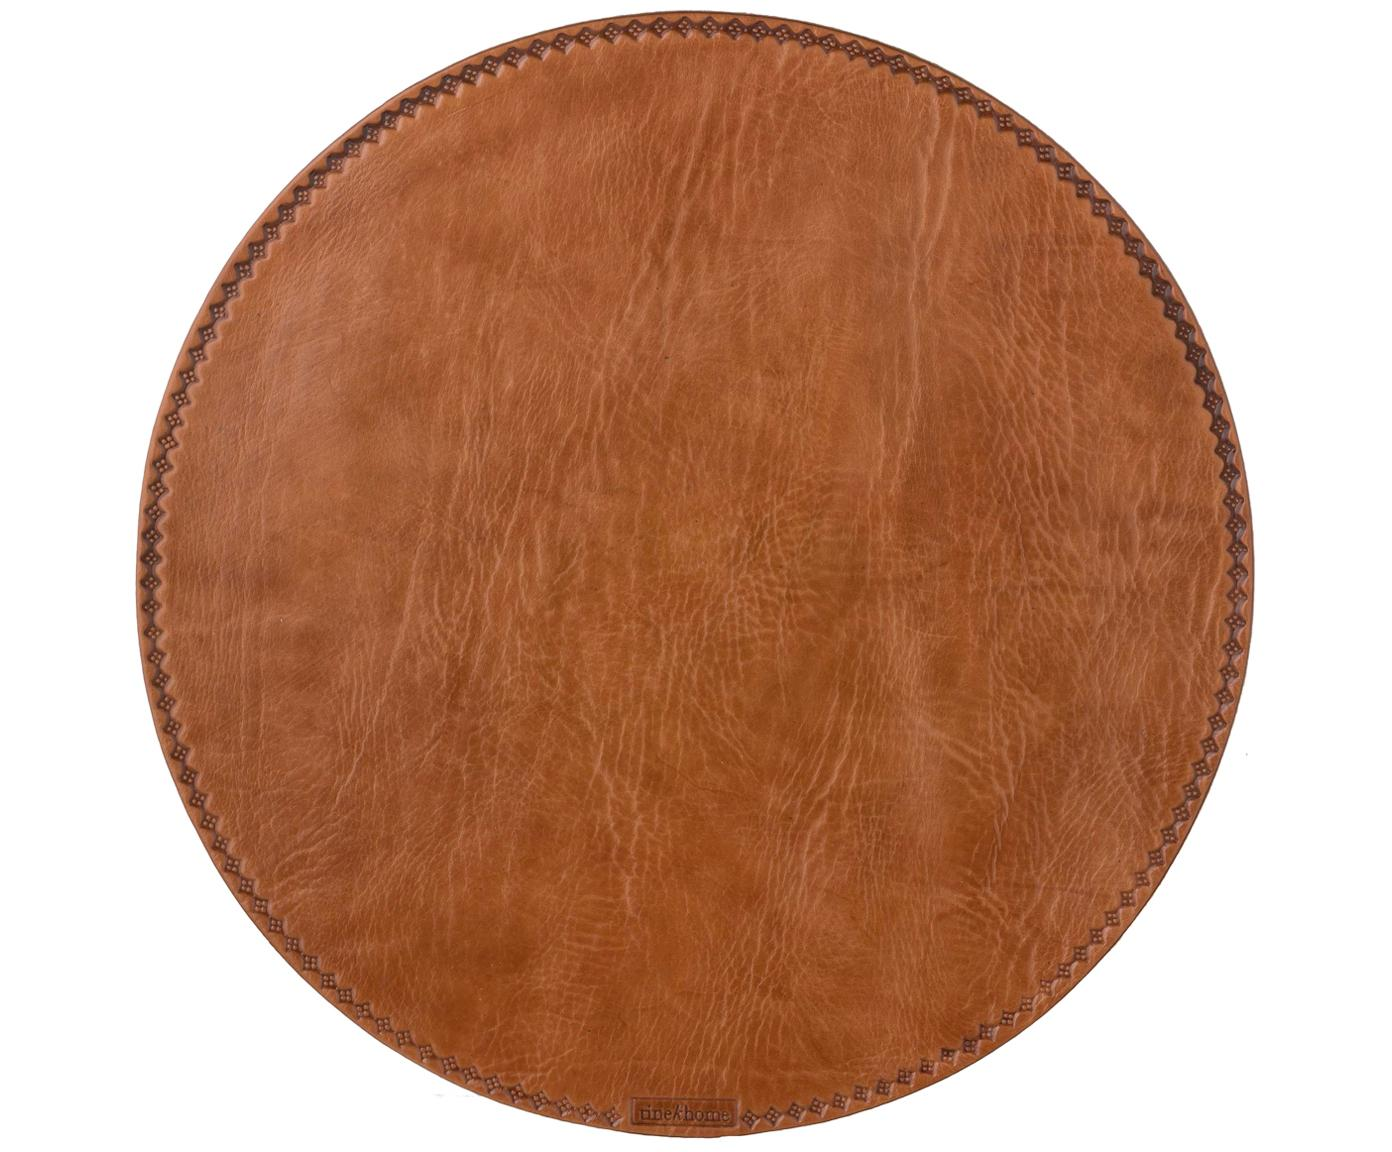 Rundes Leder -Tischset Lia, Leder, Braun, Ø 40 cm